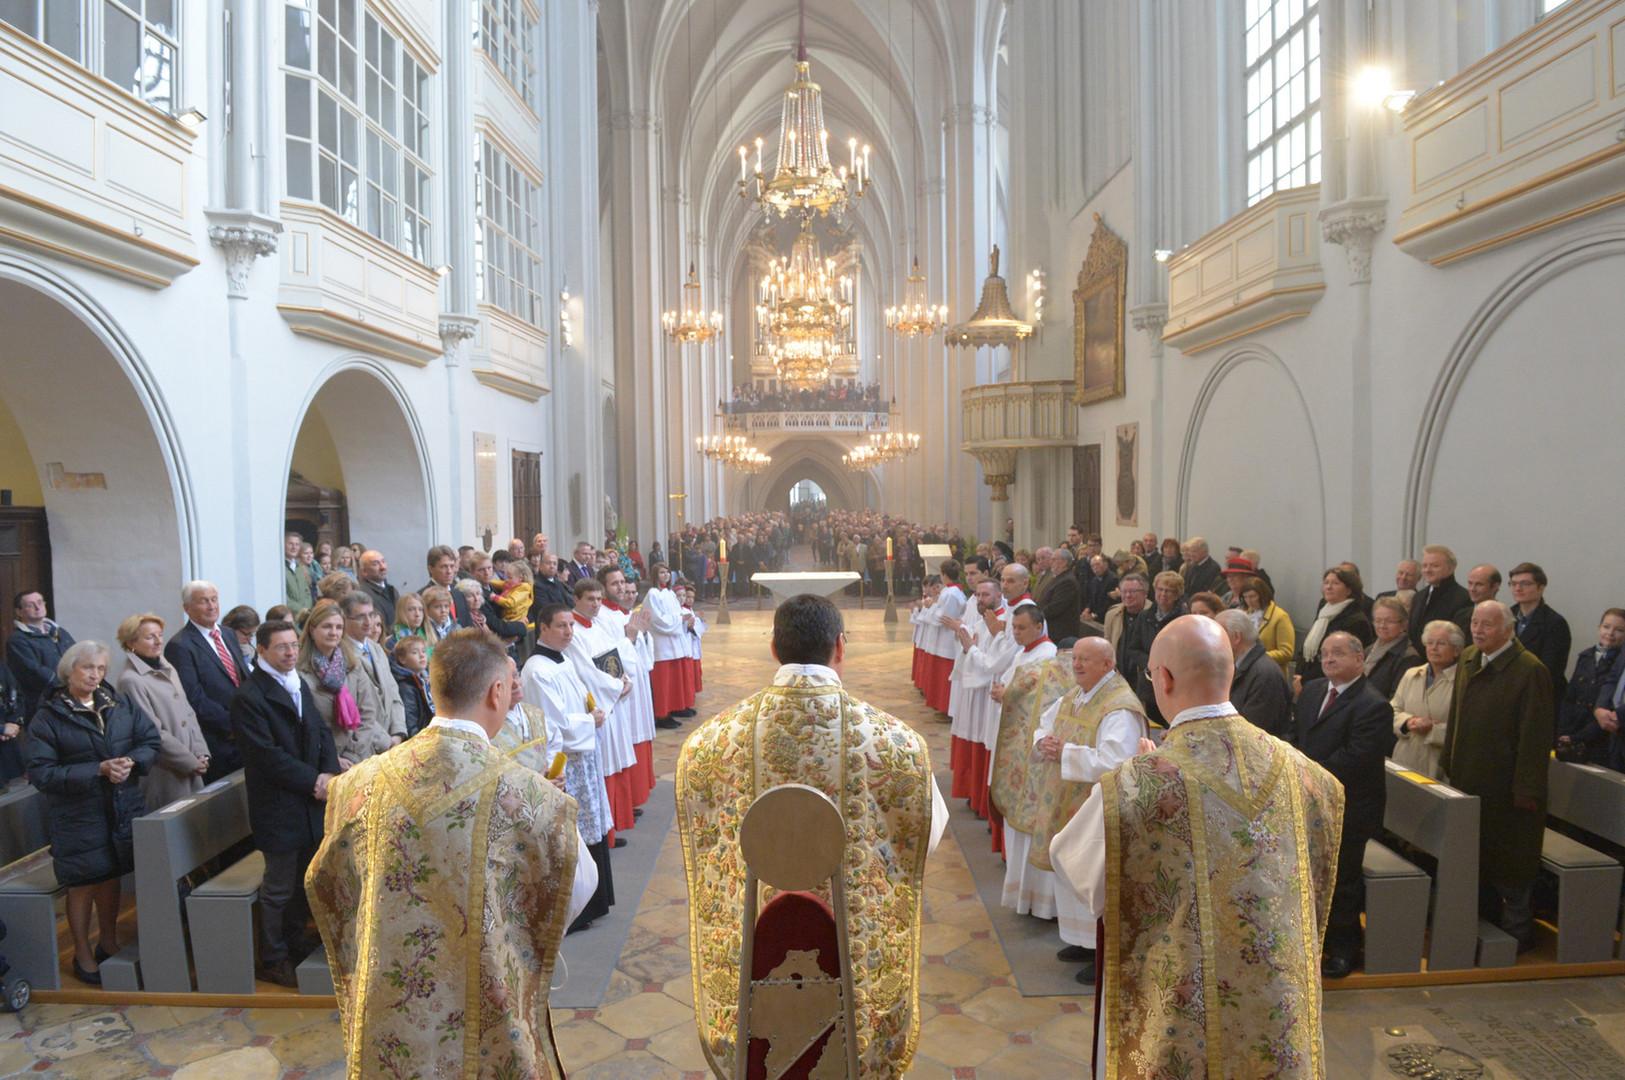 Europe_Augkirche-08.jpg